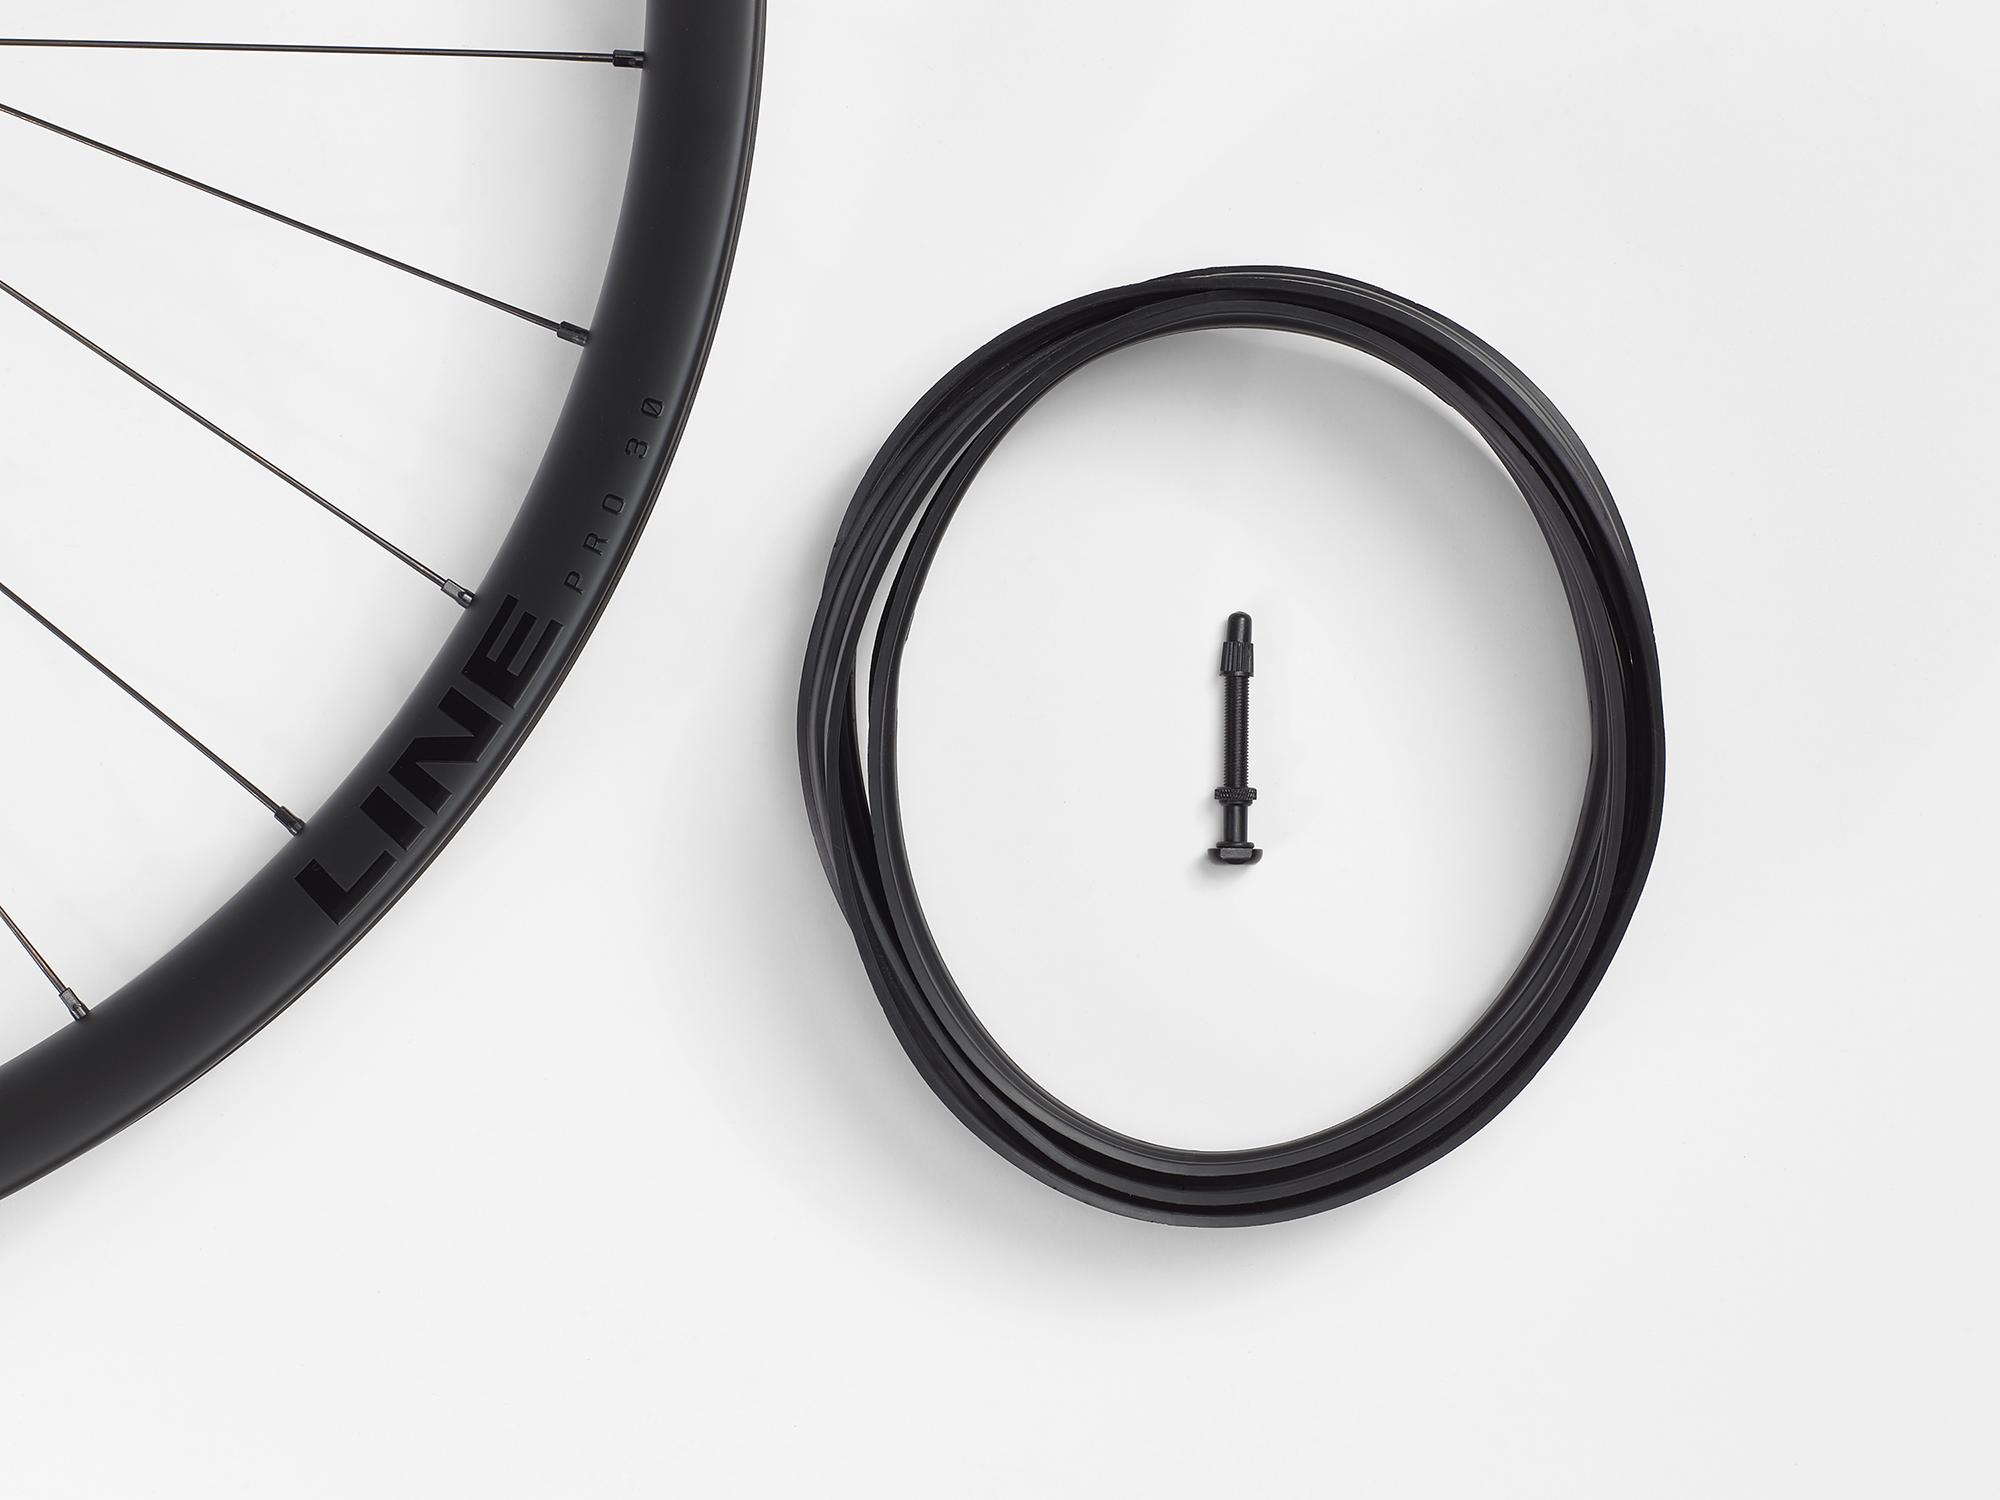 Bontrager Carbon-Laufräder: neue Line Pro und Line Elite Serie